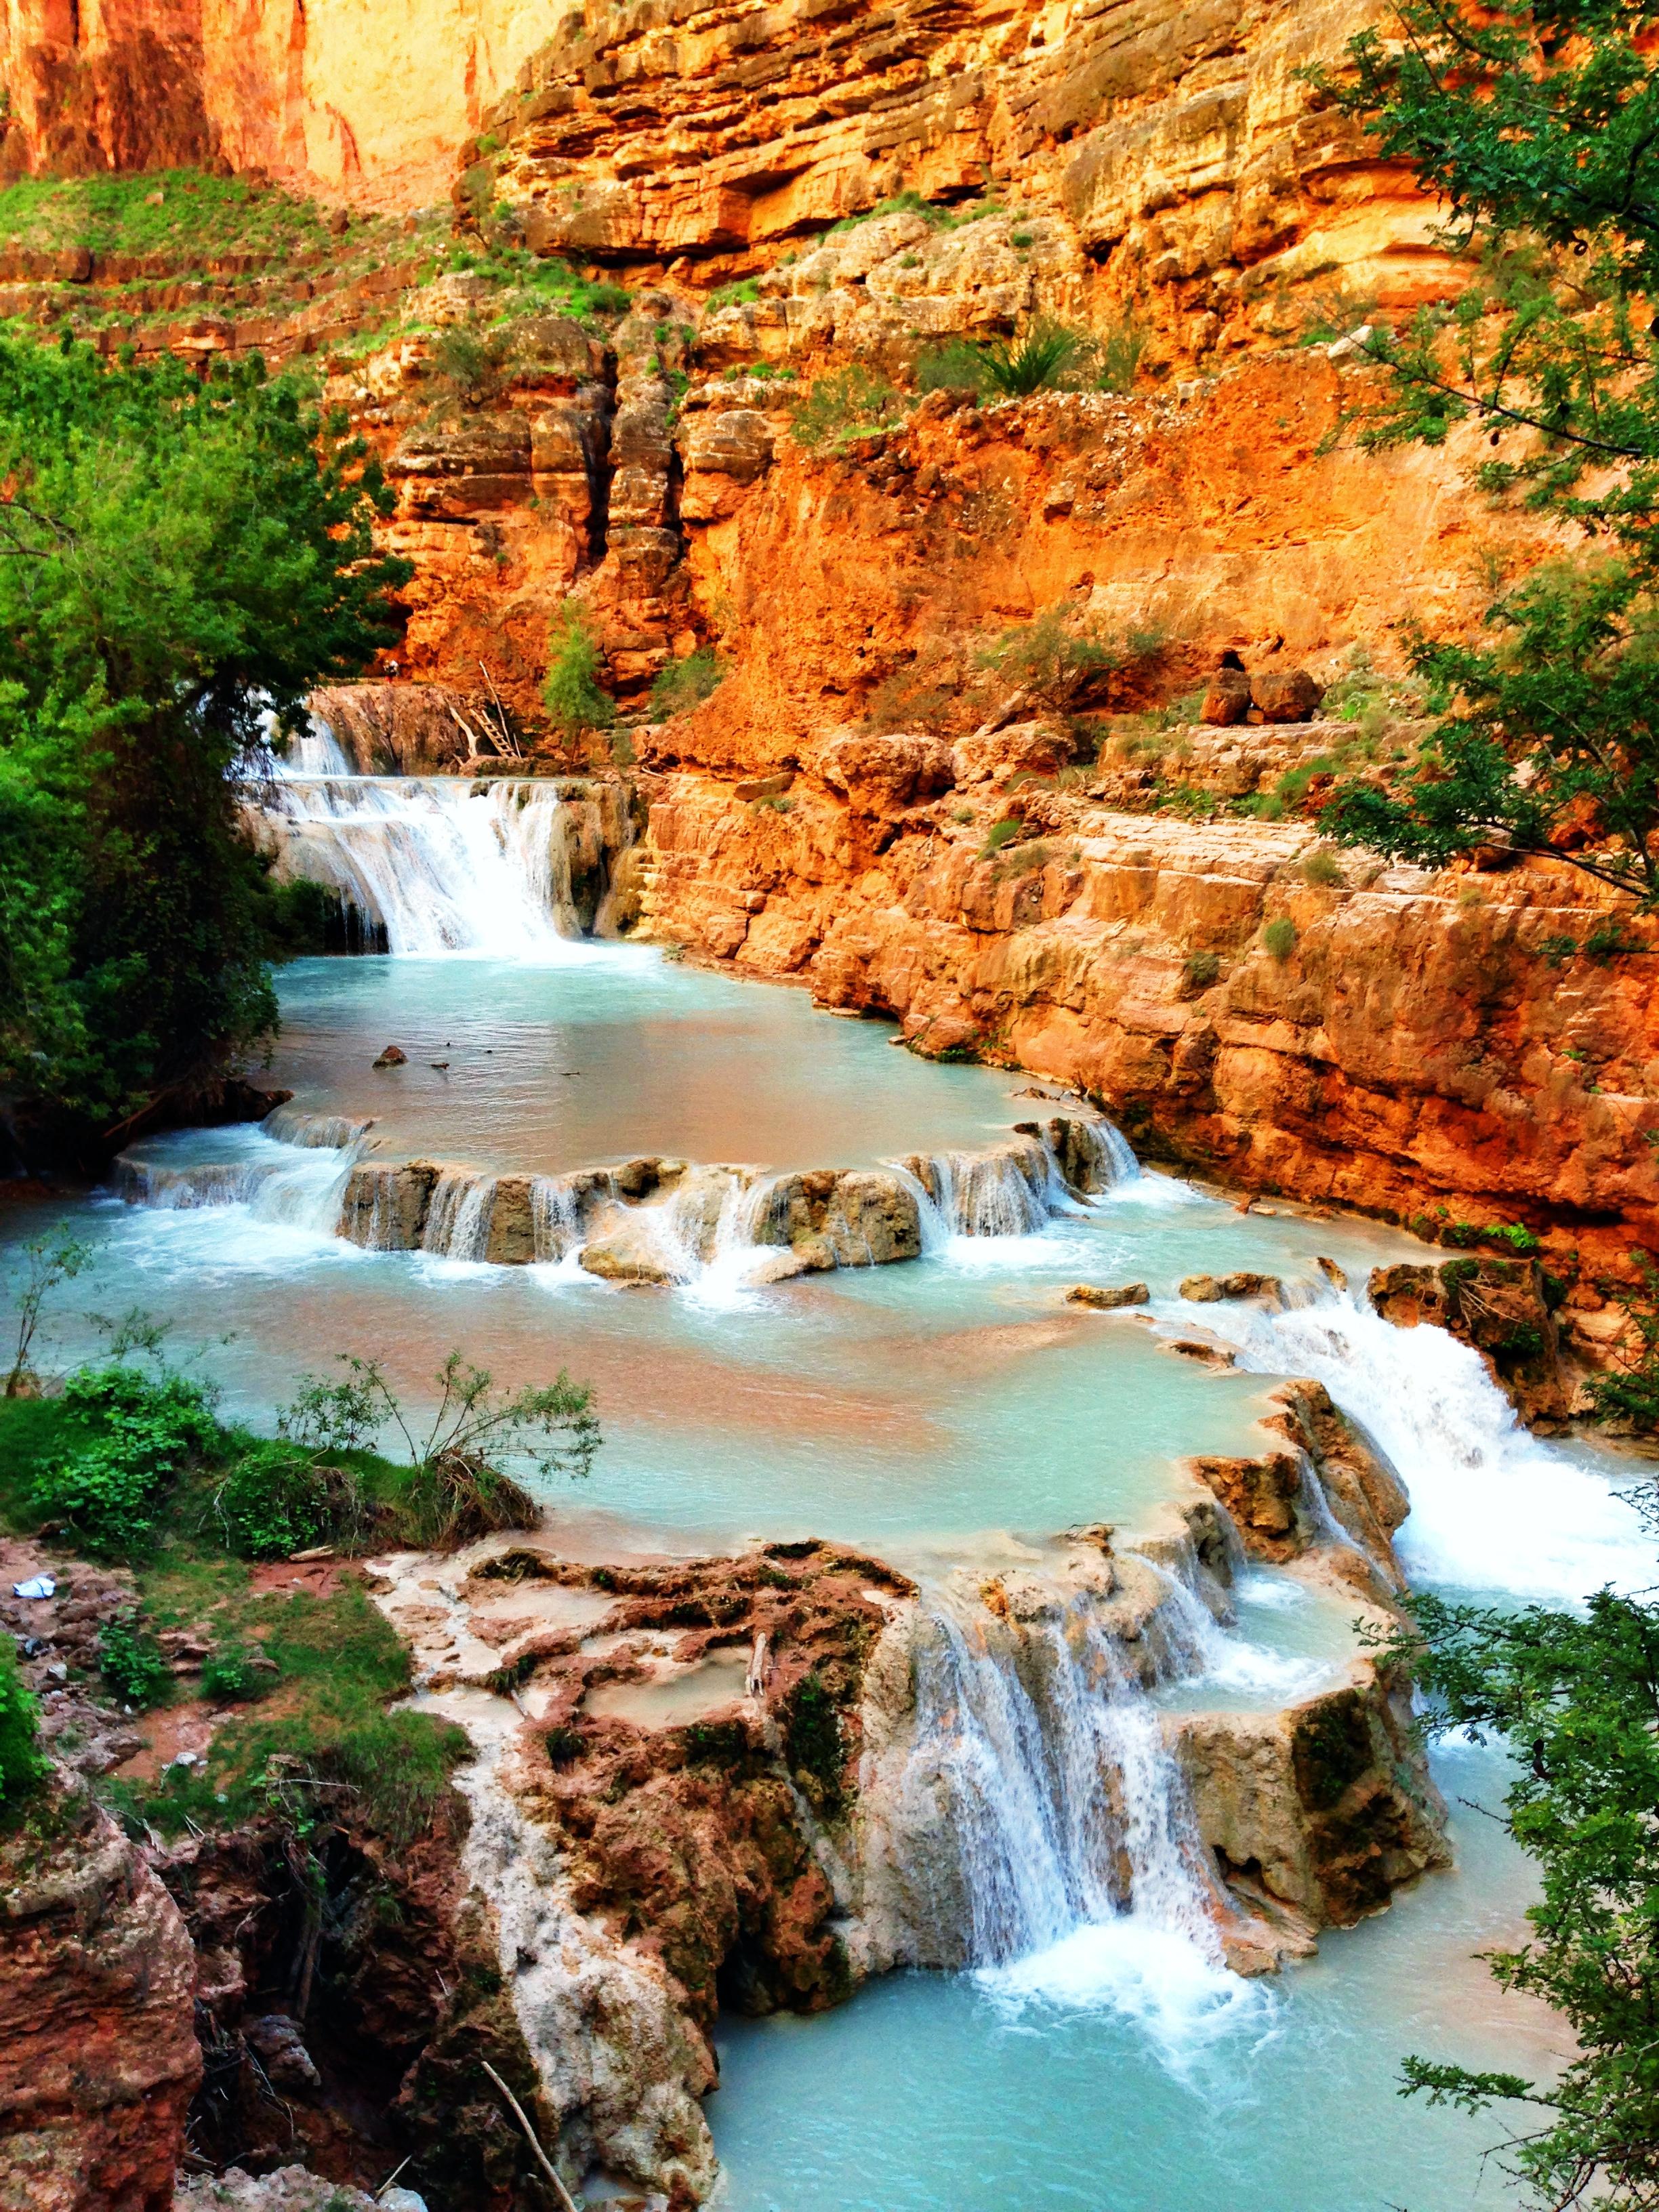 havaupai arizona desert waterfall oasis thisworldexists this world exists michelle torres